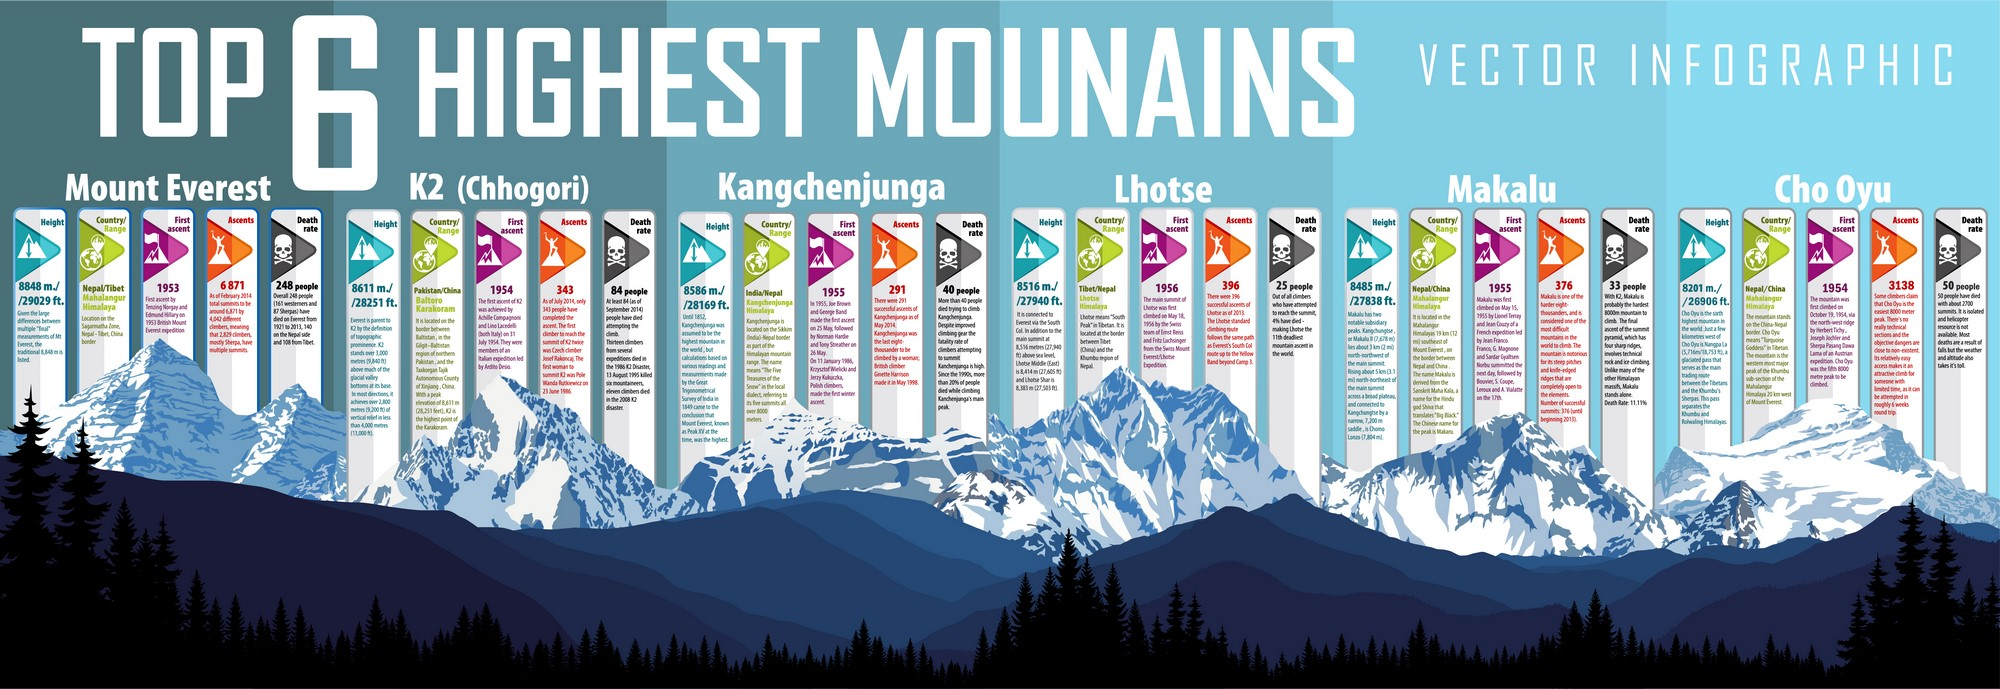 Eventi ed Attrazioni in Himalaya